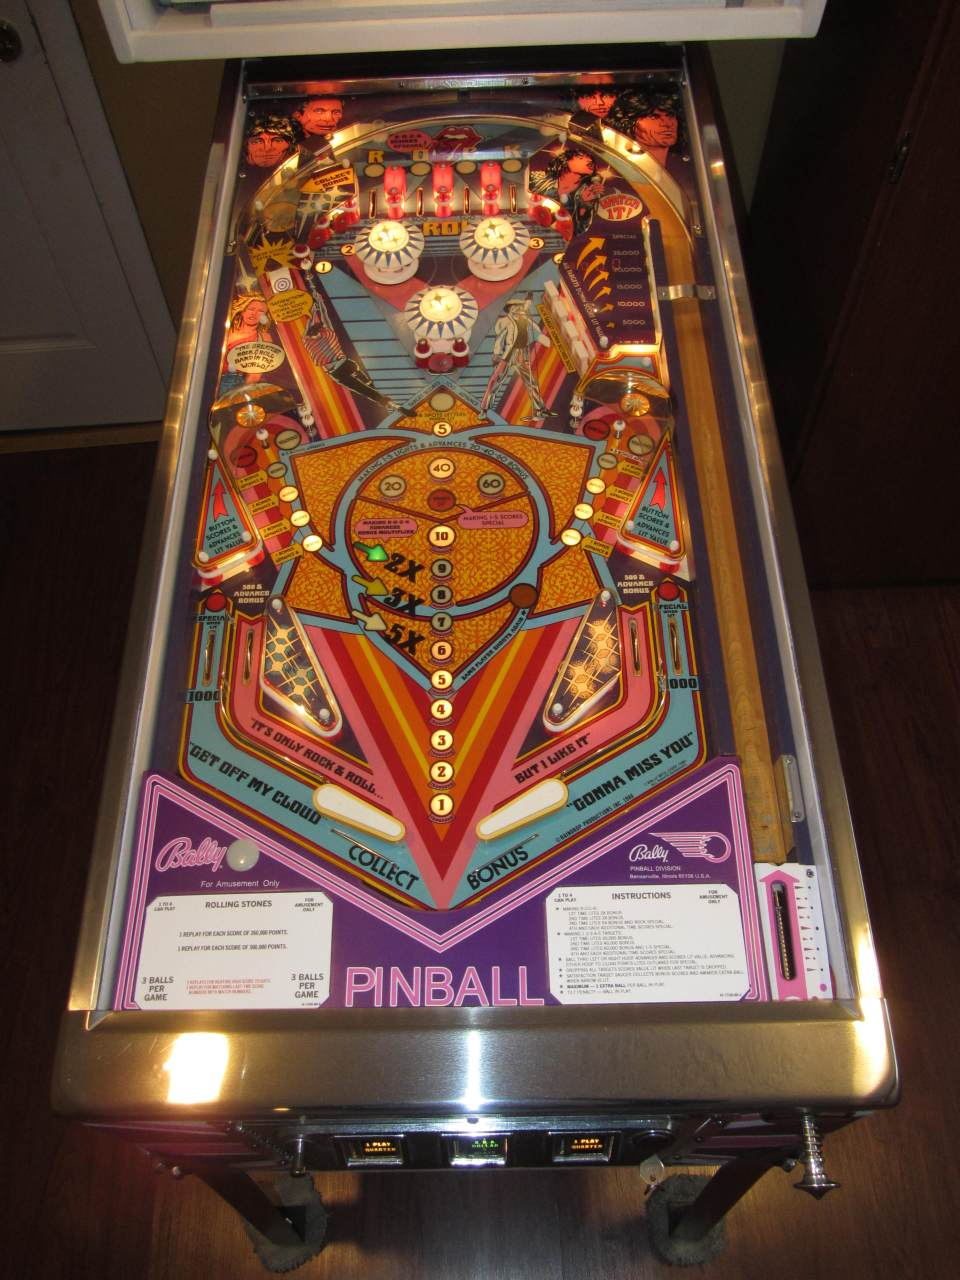 Bally Rolling Stones Pinball Machine 2 Pinballmania Llc